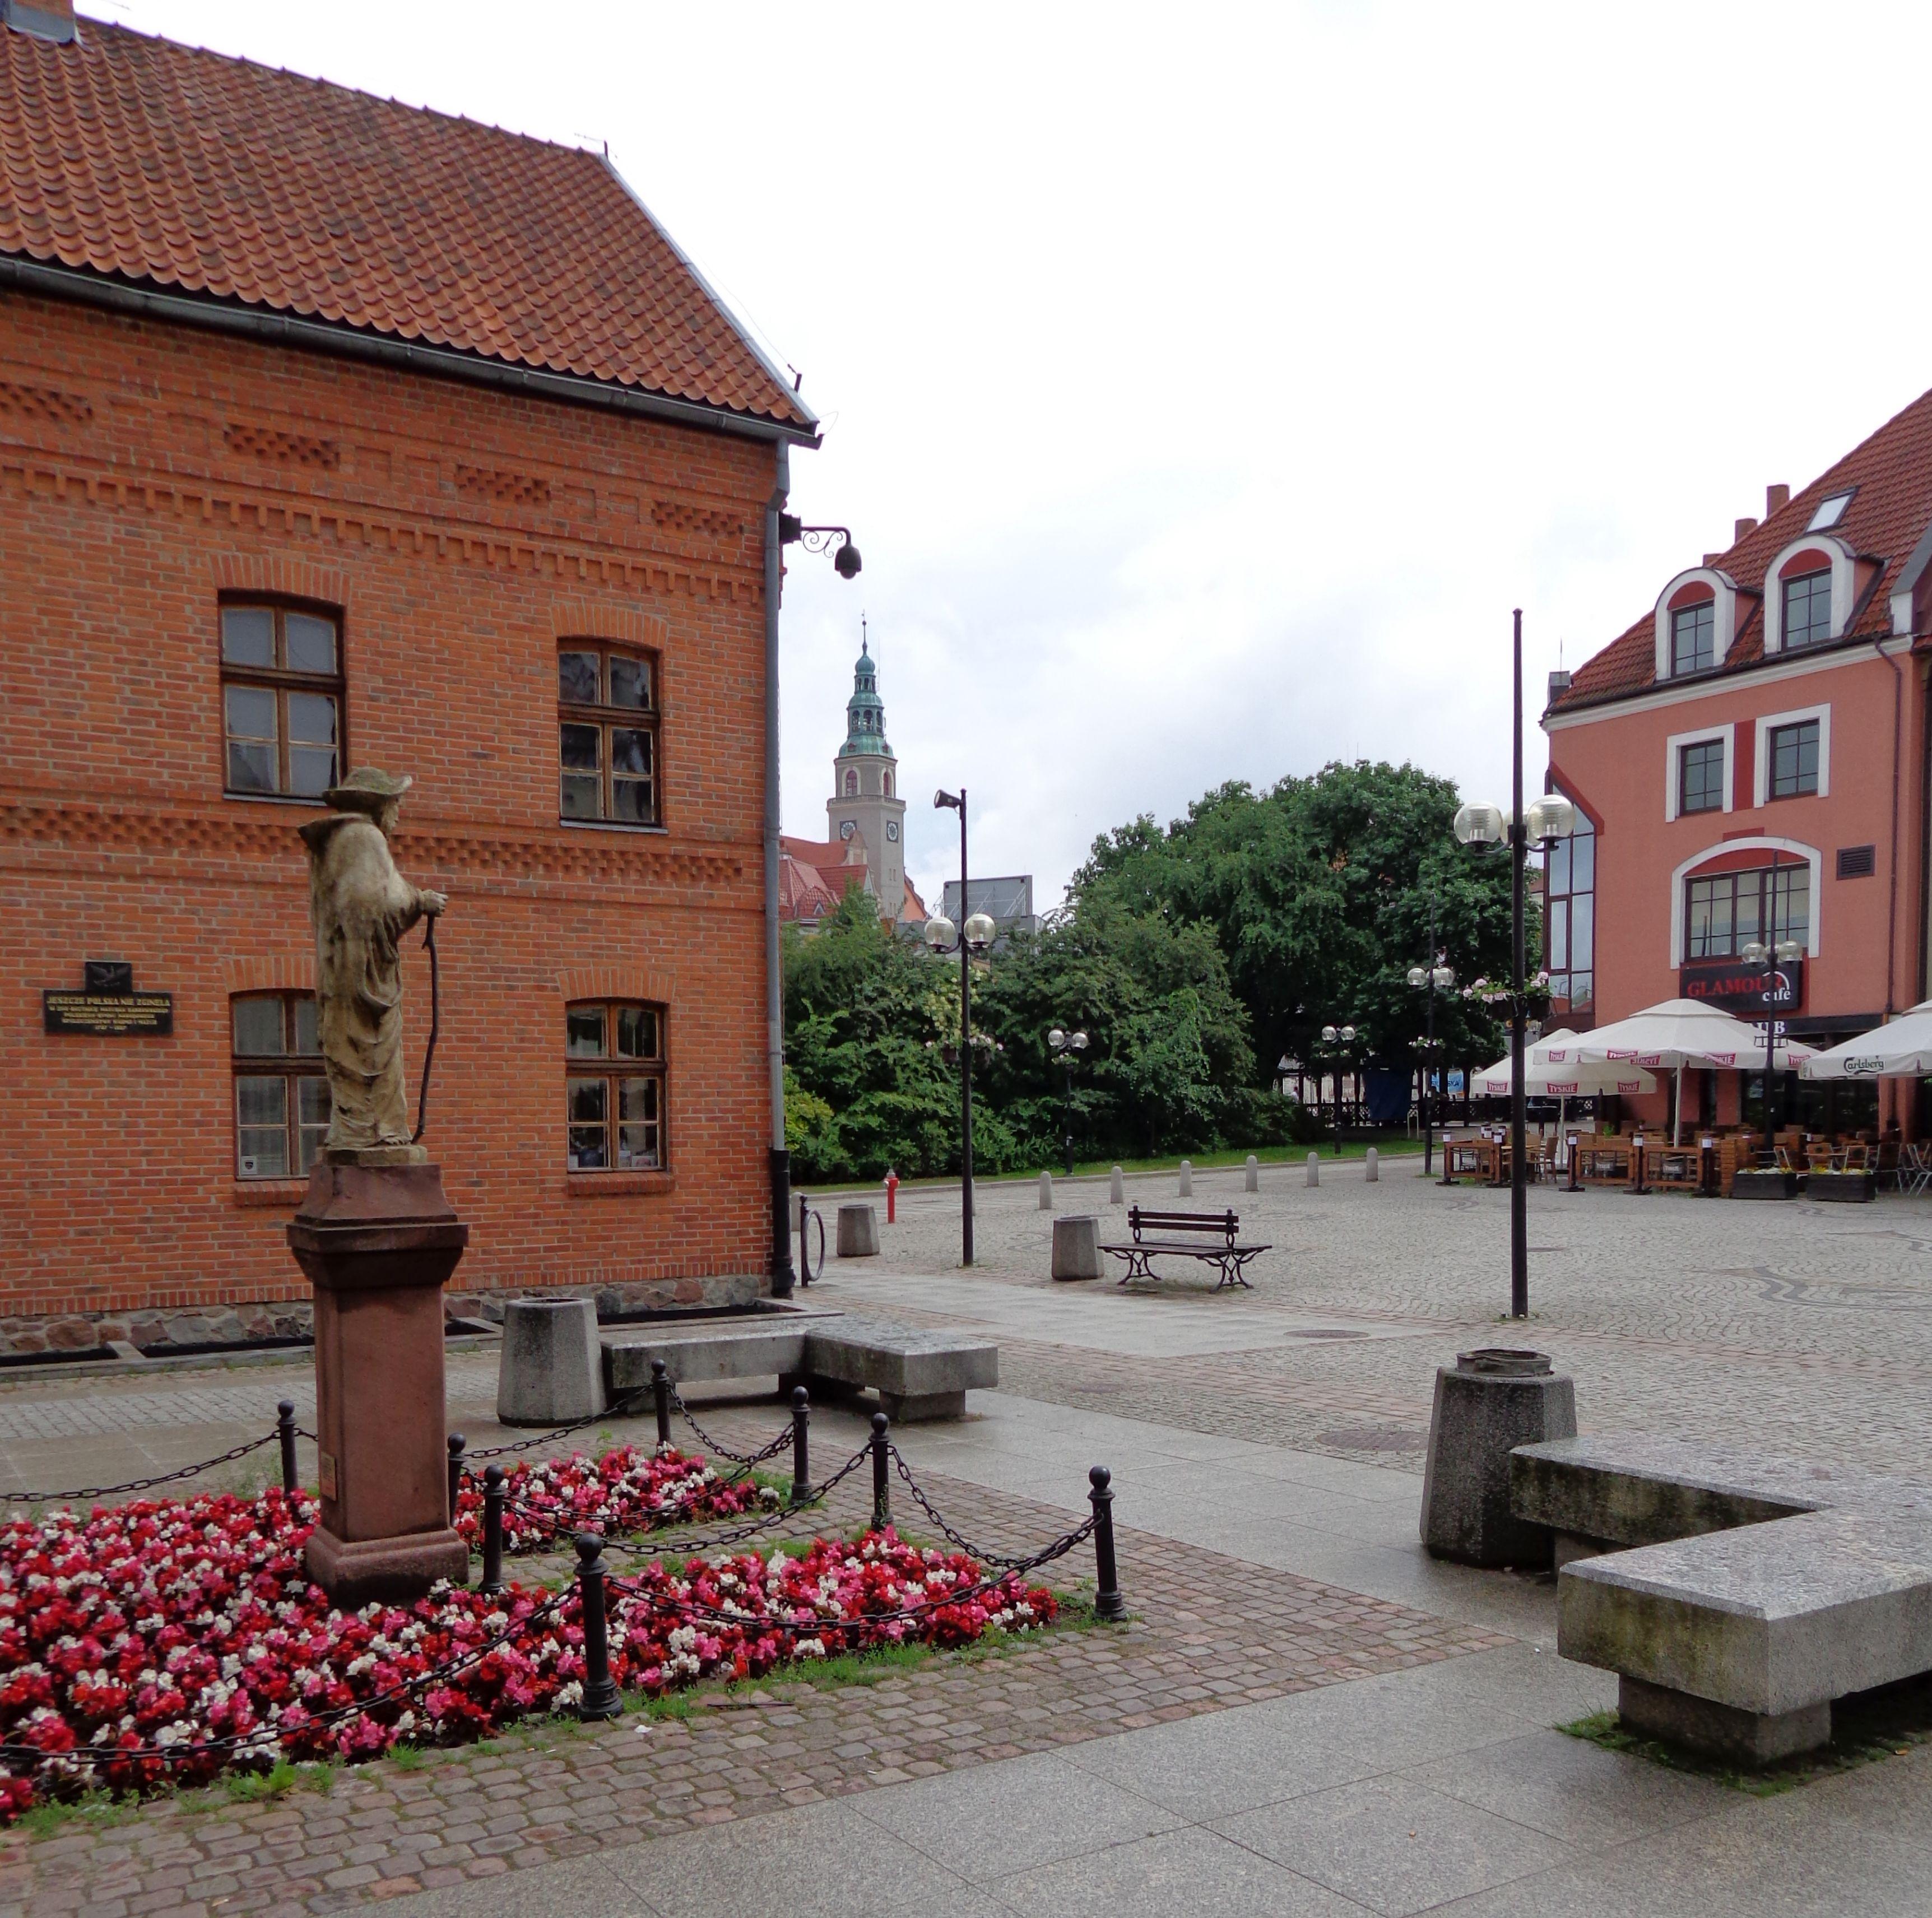 Targ Ribny Olsztyn/Allenstein mit Gazeta Olsztynska und Neuem Rathaus im Hintergrund, Foto: B. Jäger-Dabek,